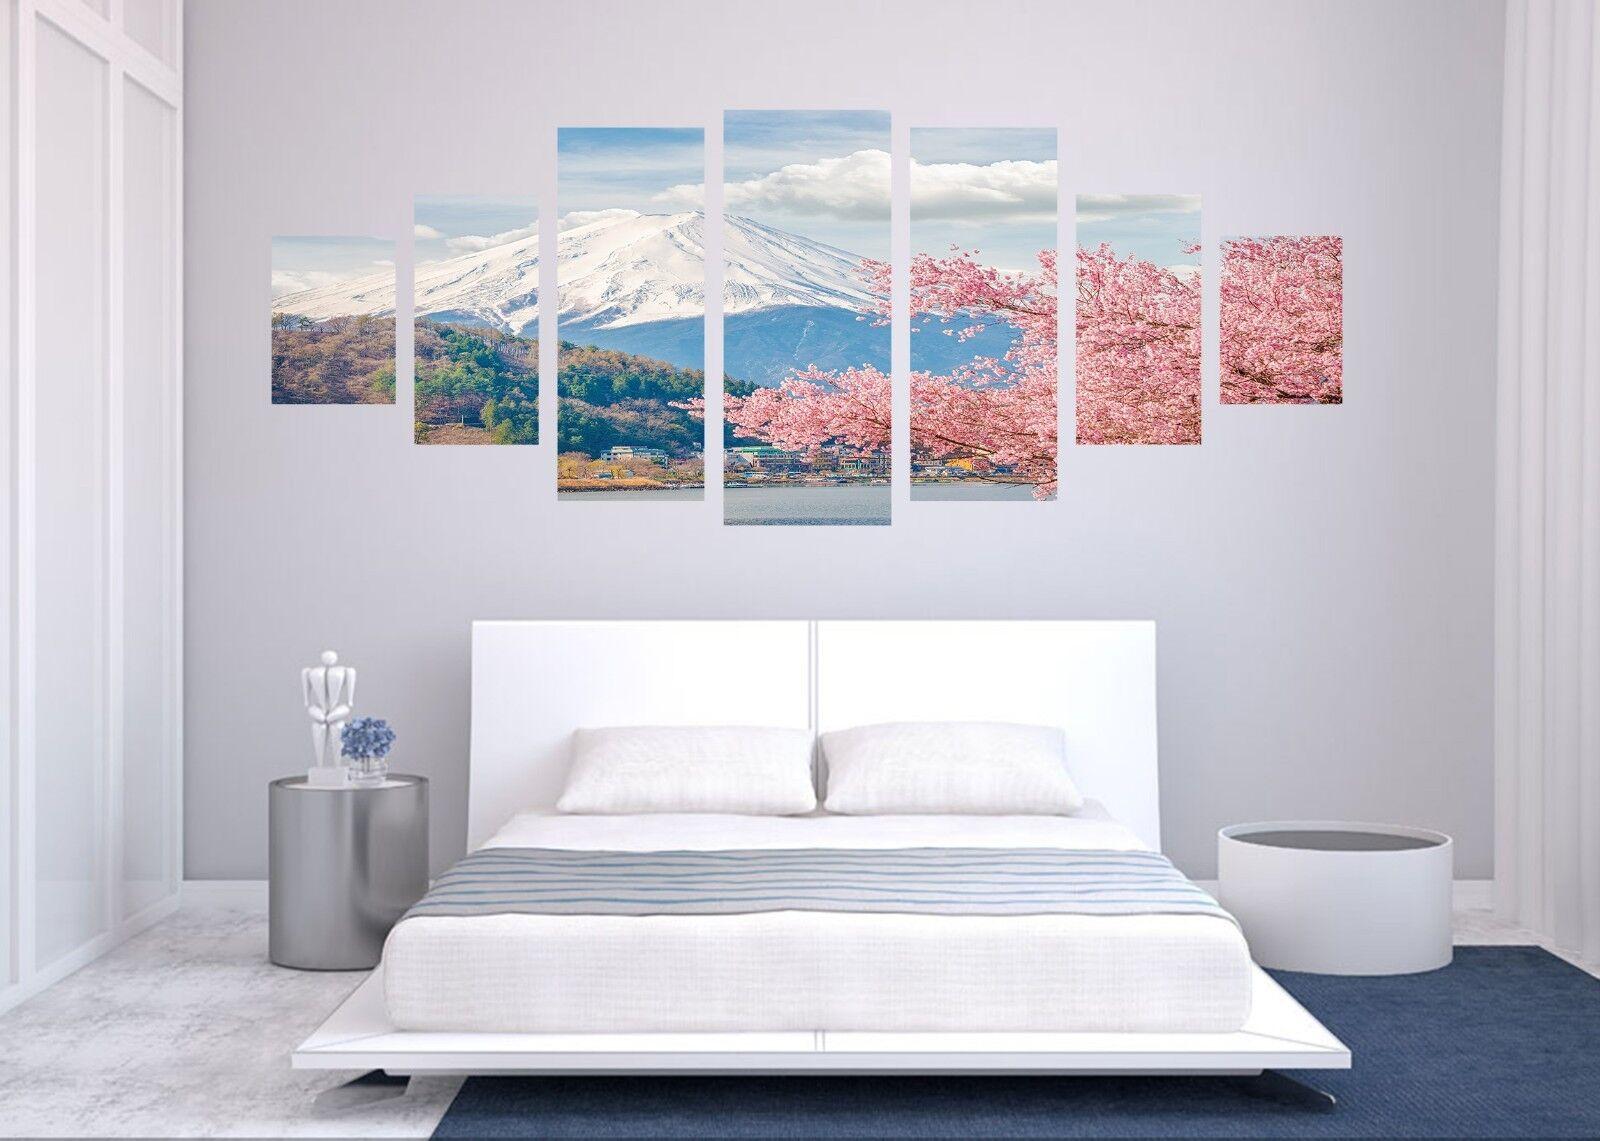 3D Sky Mount Fuji 566 Unframed Drucken Wand Papier Decal Wand Deco Innen AJ Wand